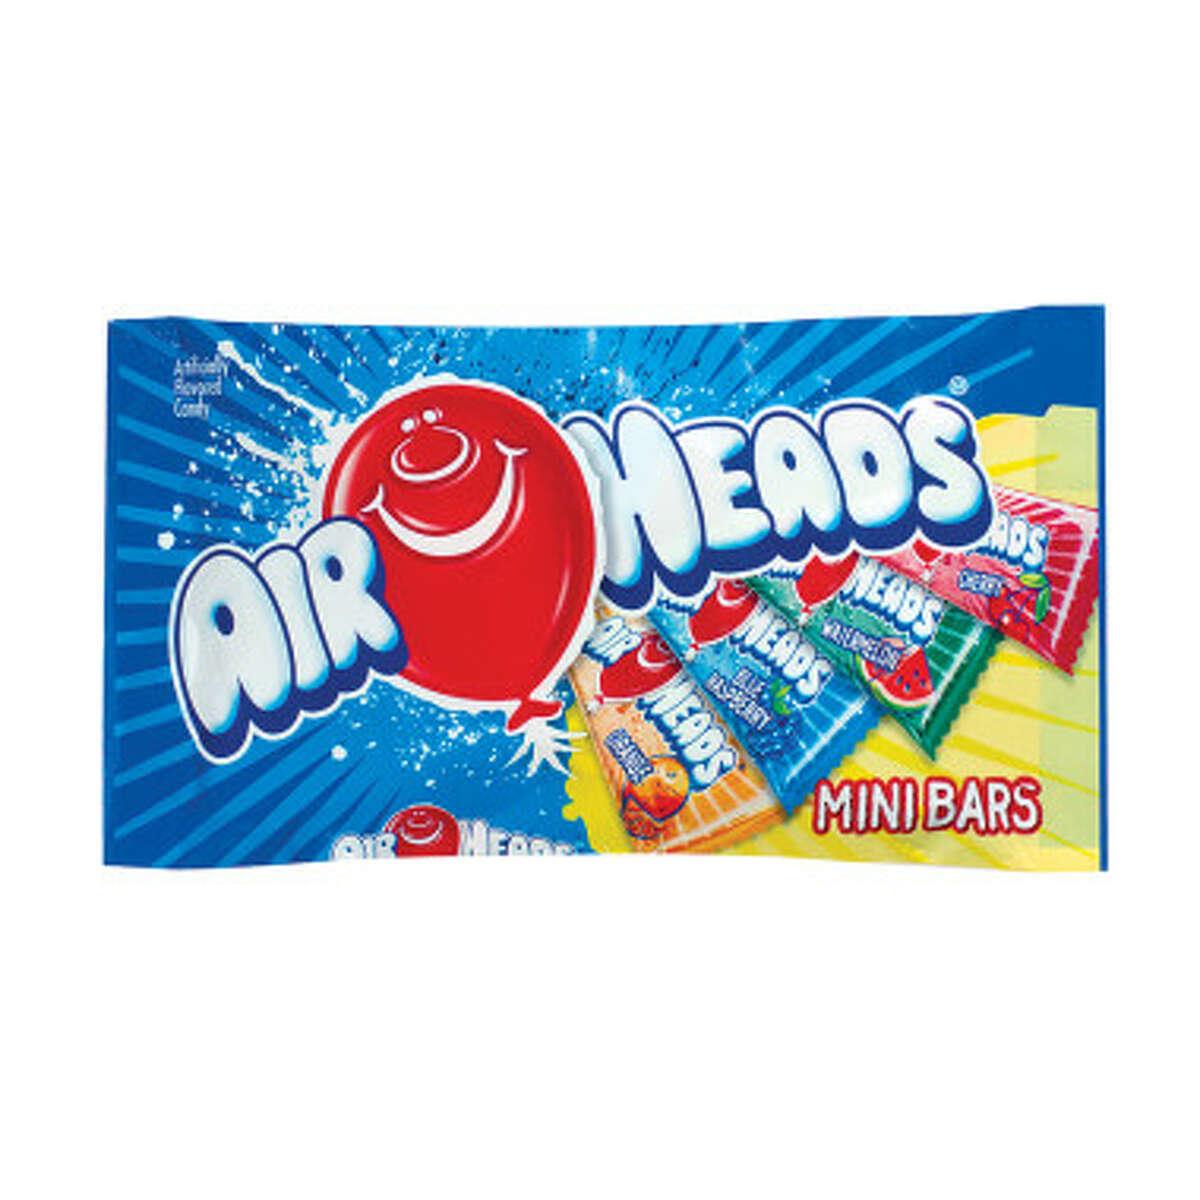 Alabama - AirHeads